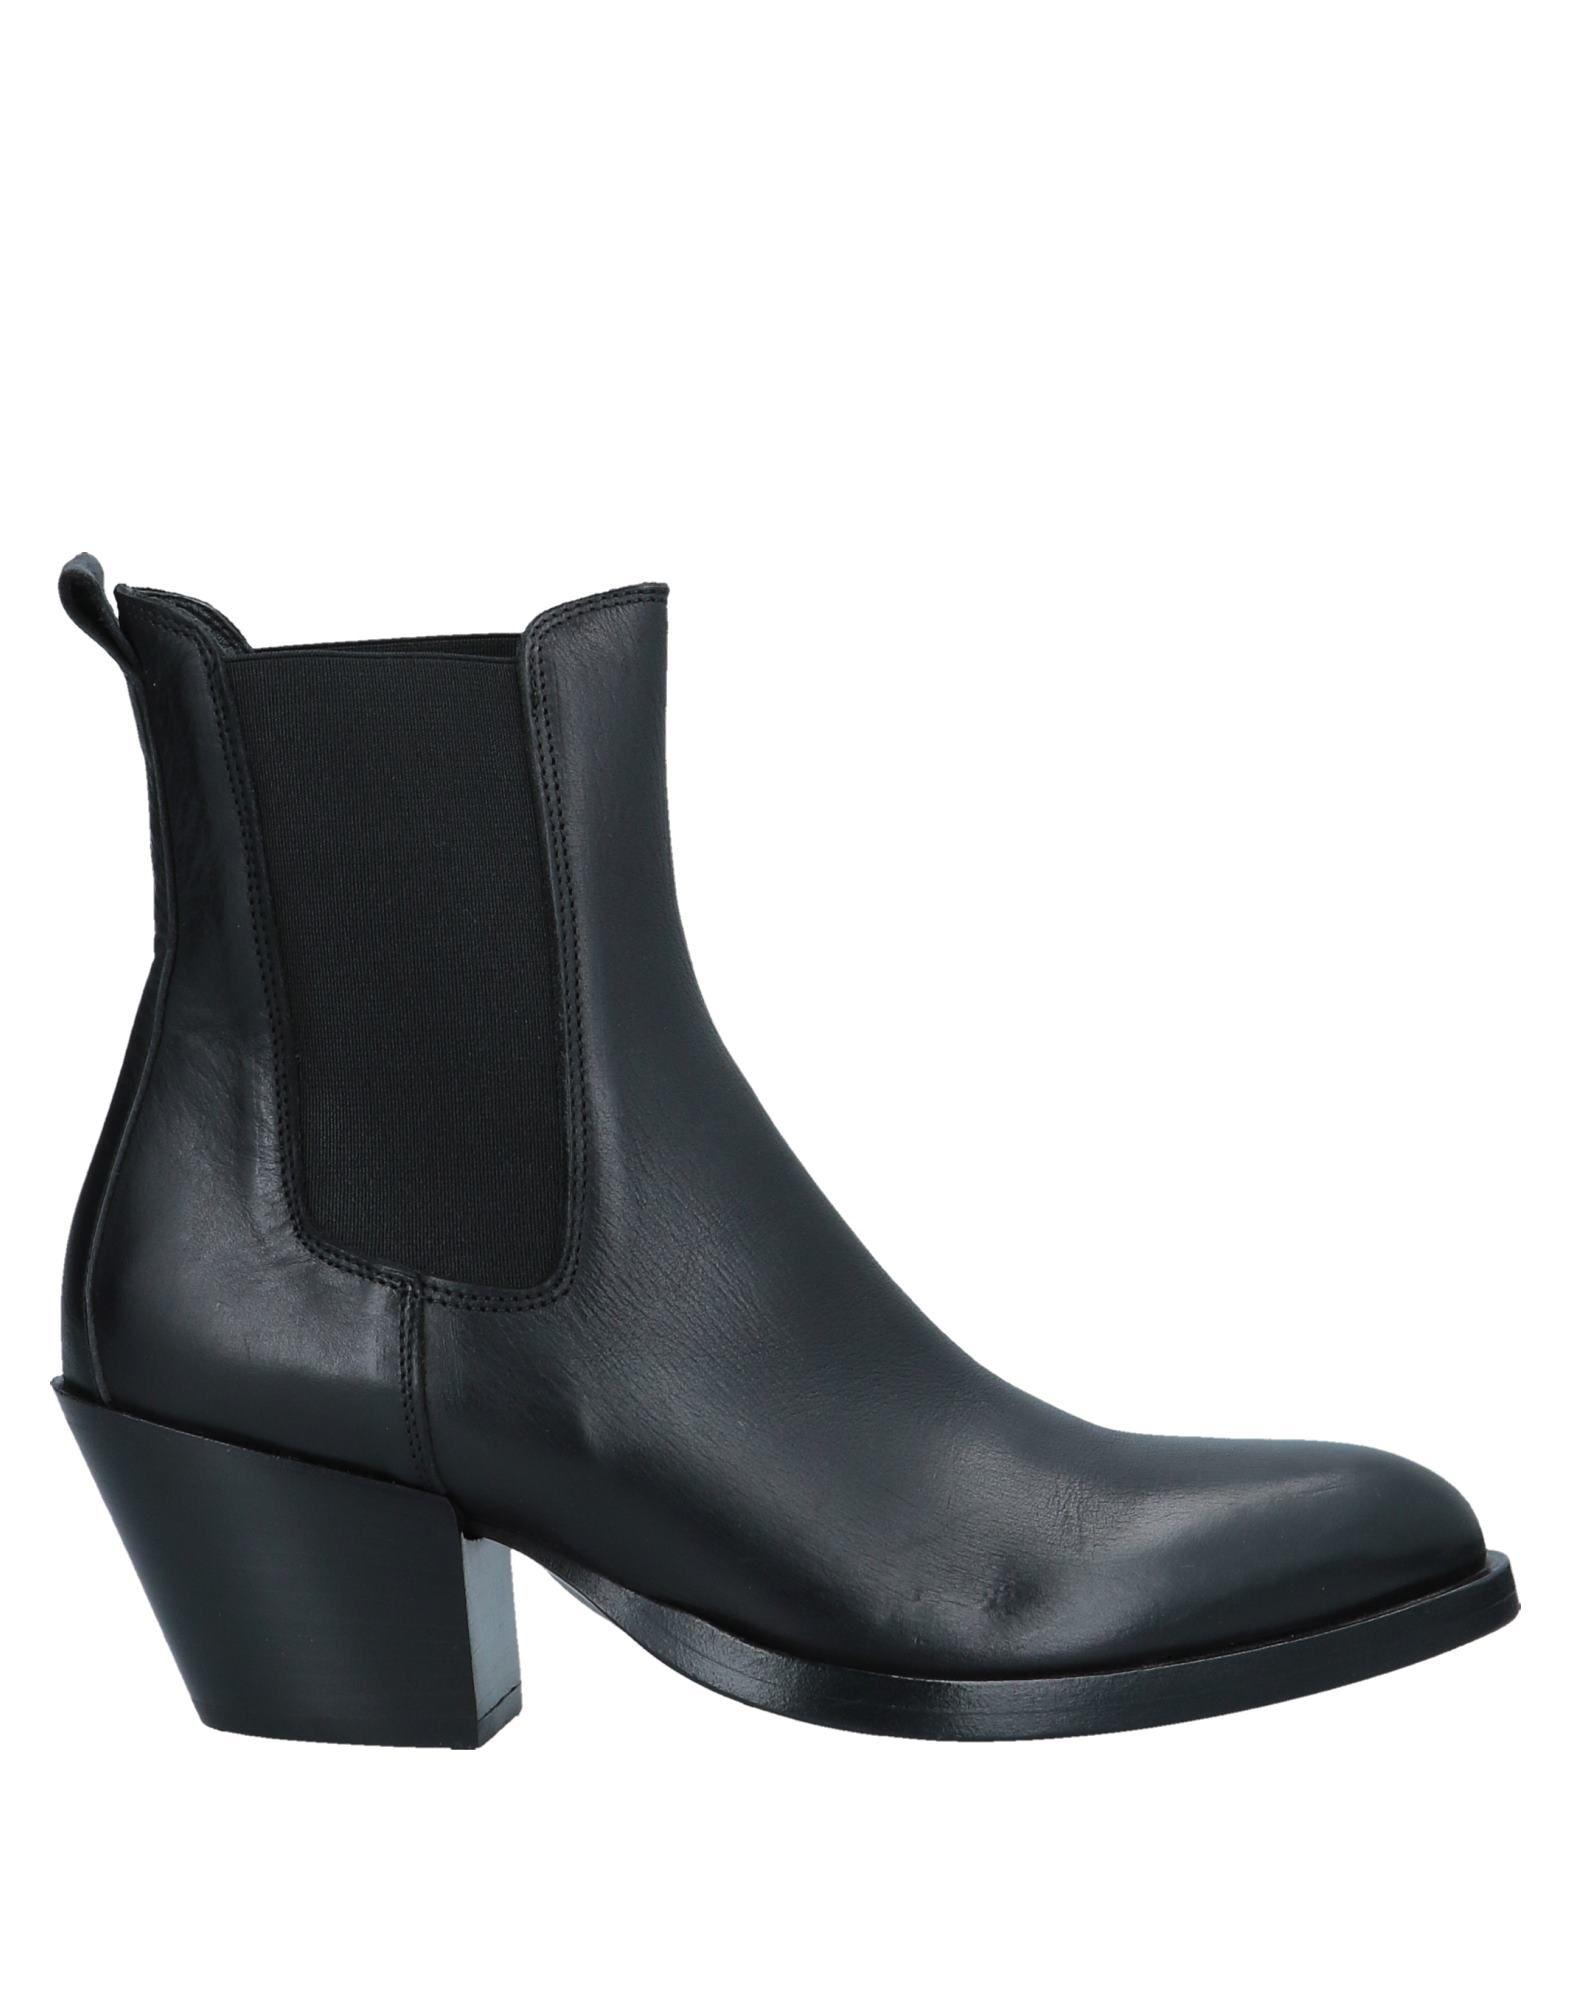 BRYAN BLAKE Полусапоги и высокие ботинки cie round toe mackay blake custom handmade calf genuine leather outsole breathable men s casual oxfords color purple shoe ox519